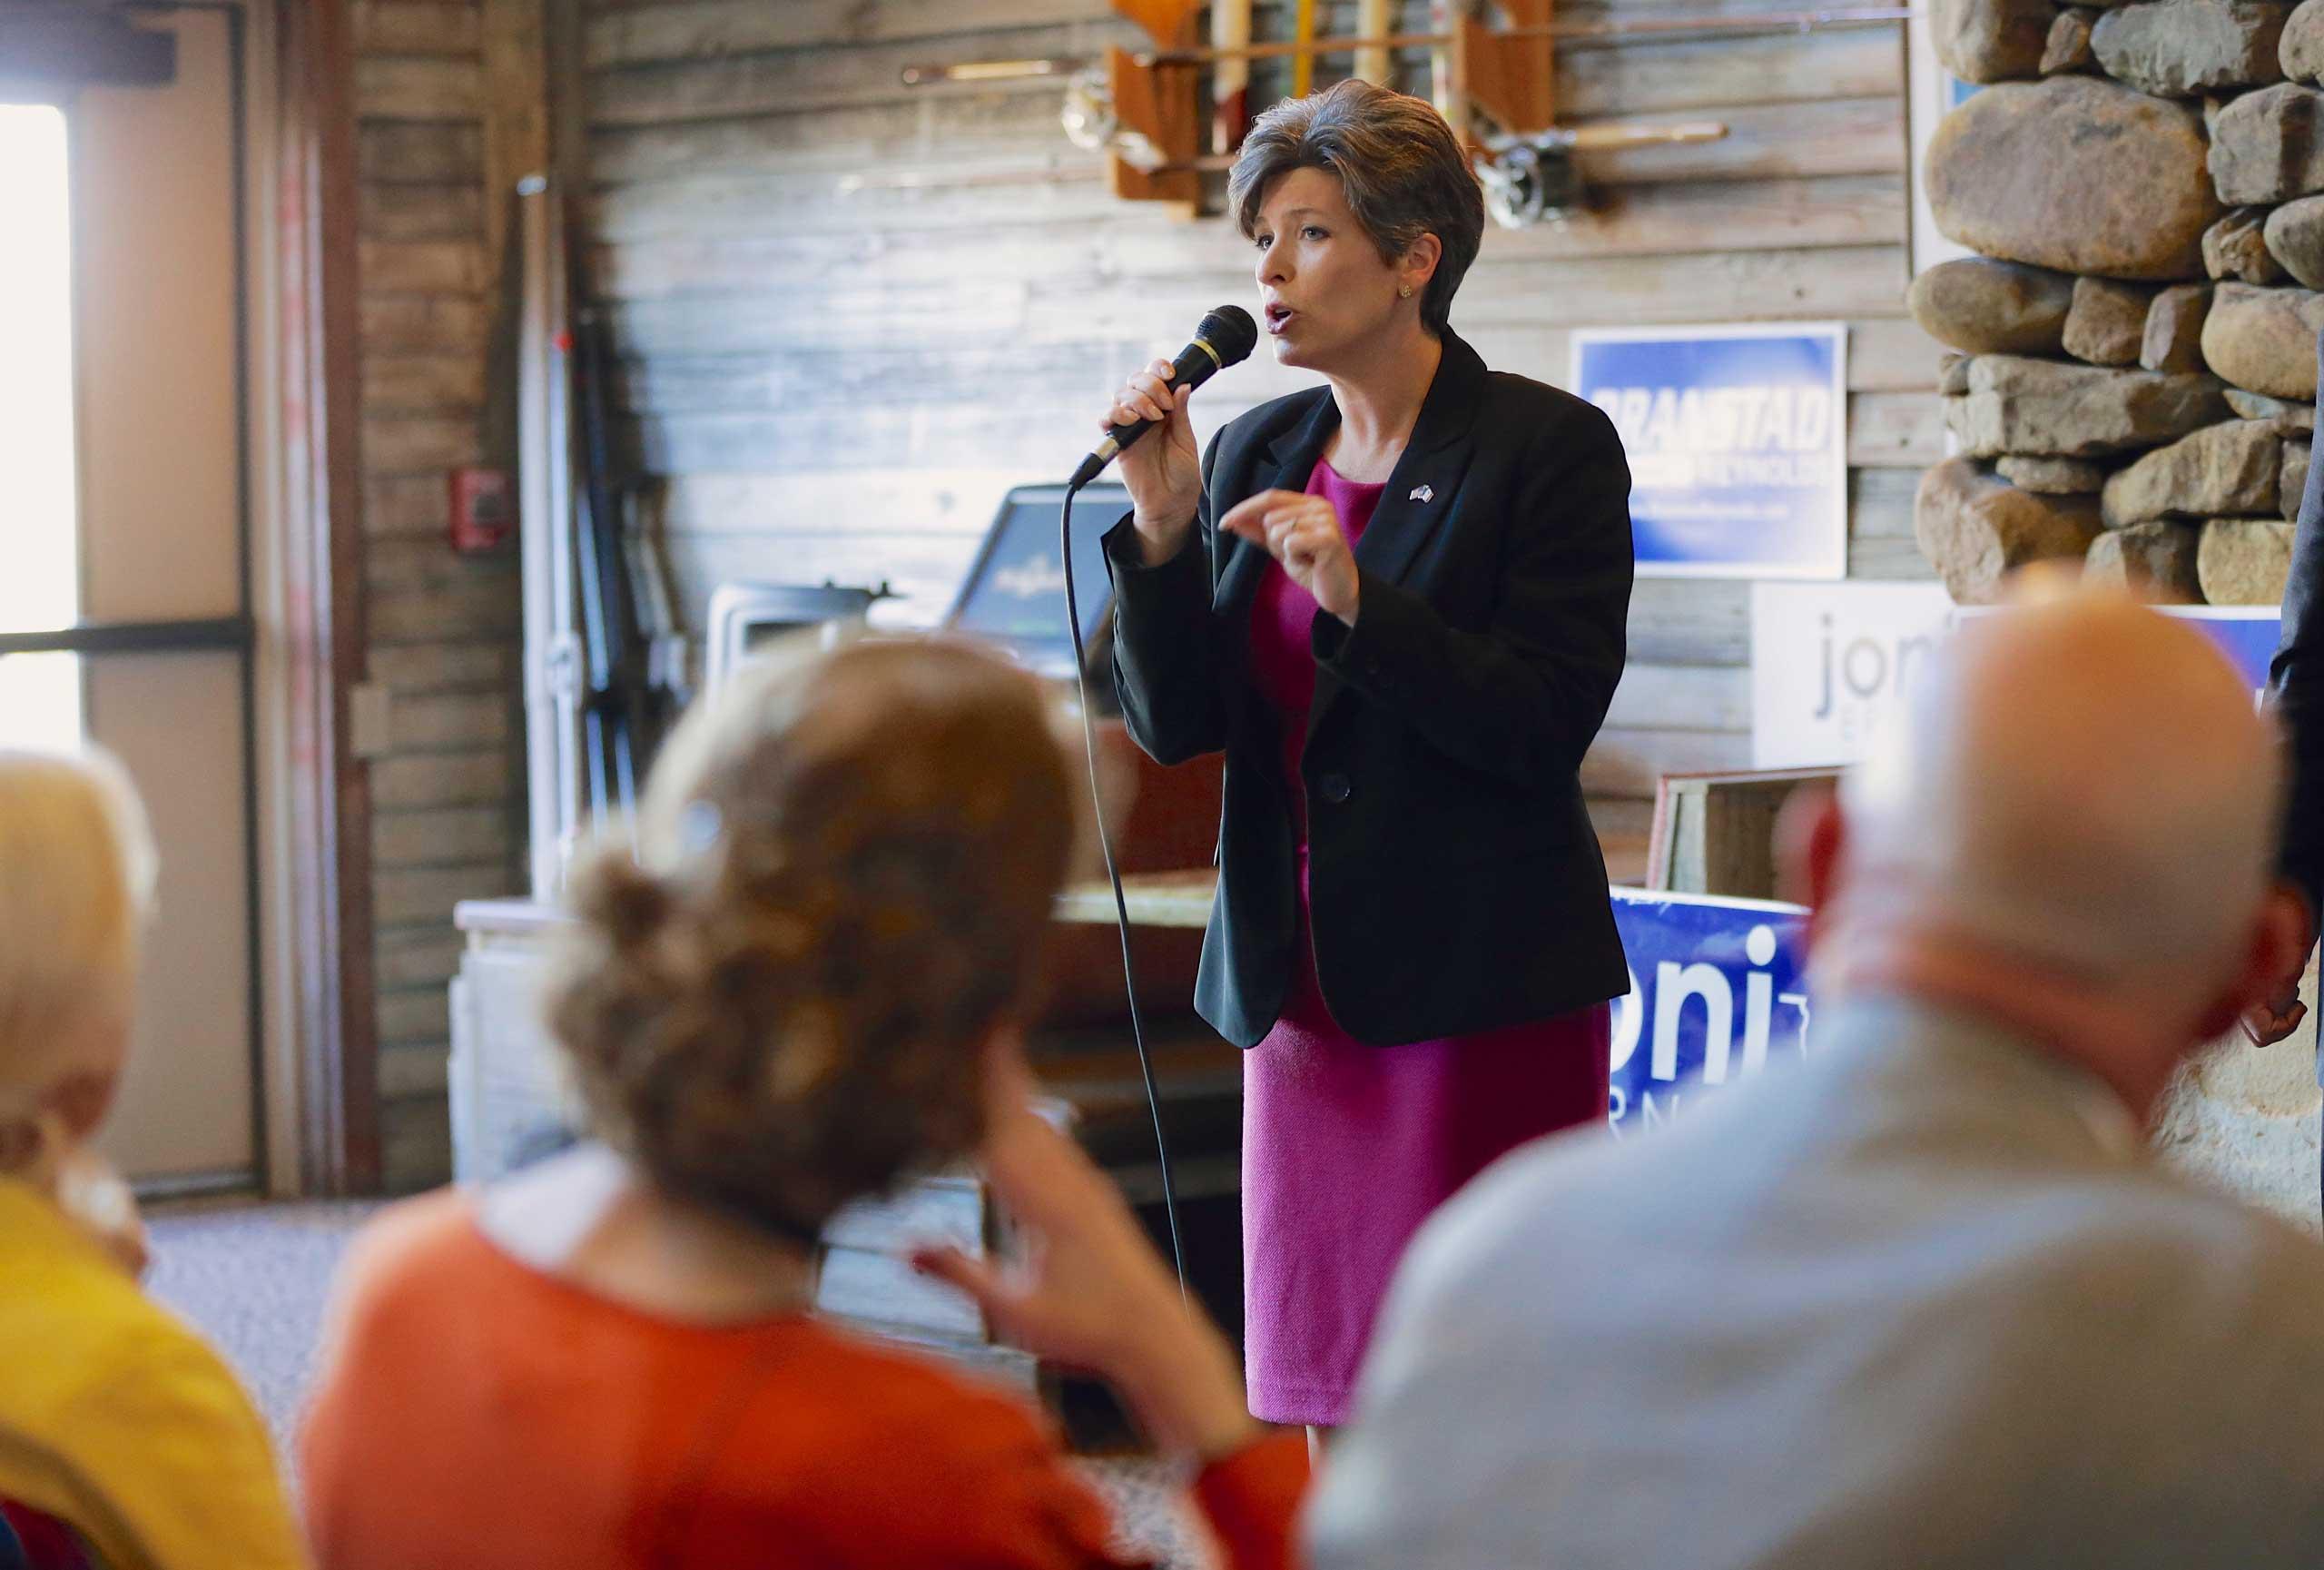 Republican Senate candidate Joni Ernst speaks during a campaign stop in Council Bluffs, Iowa, Oct. 31, 2014.